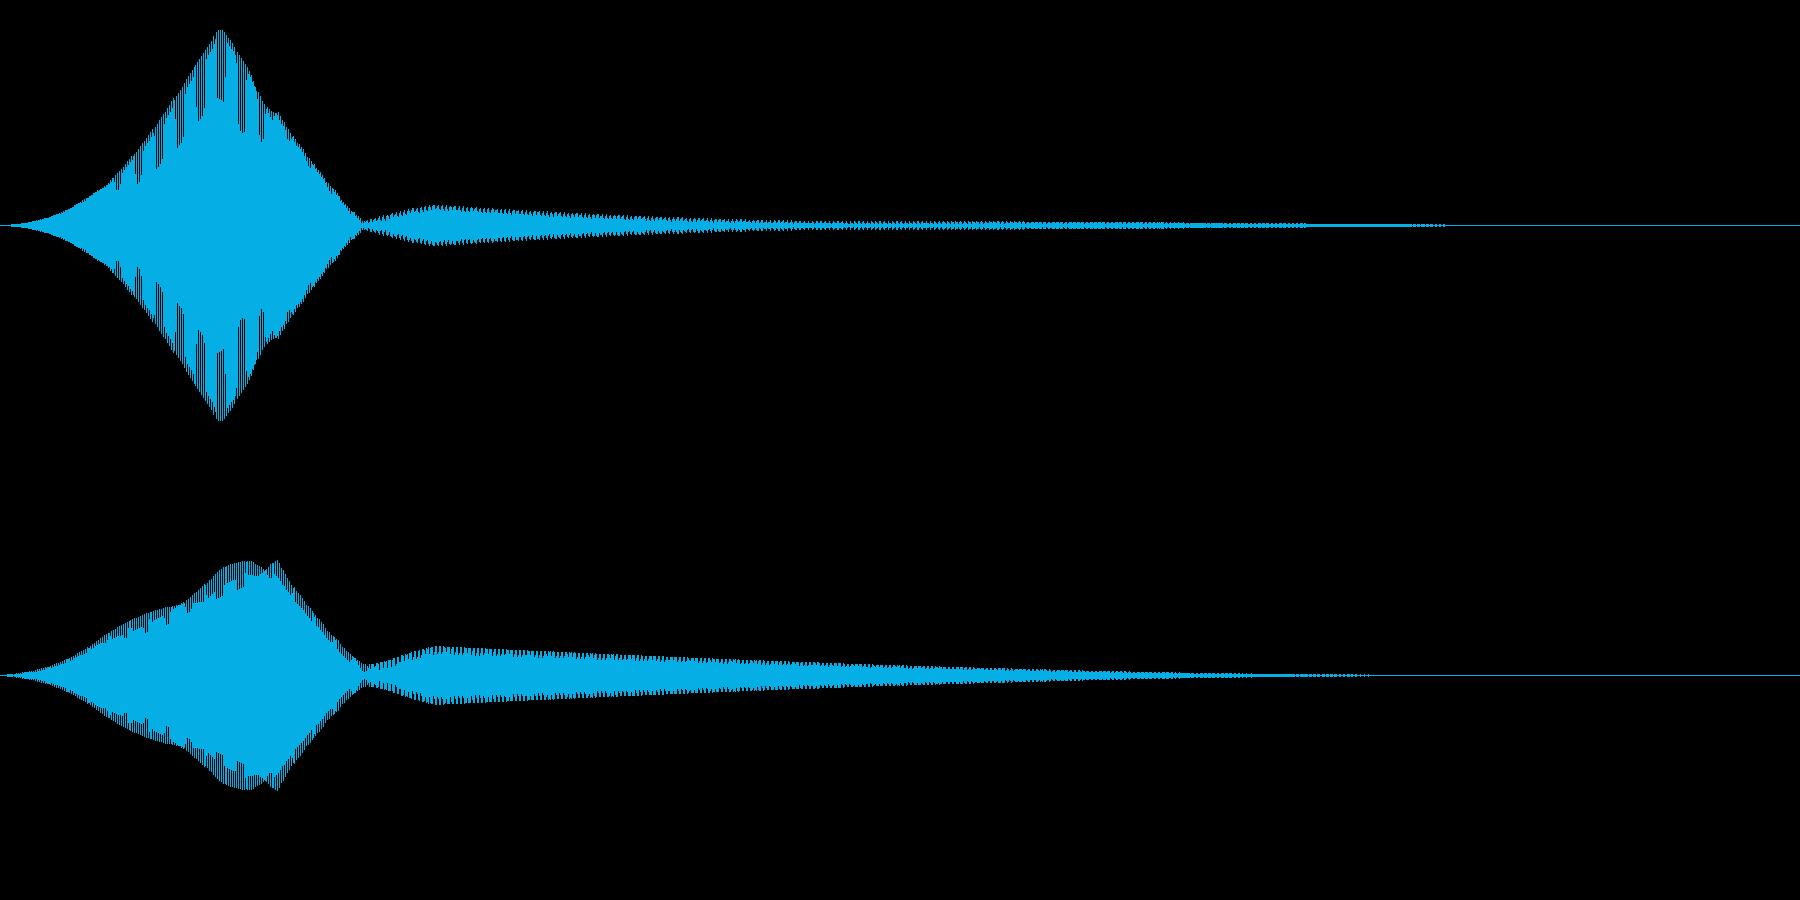 FutureSF 生体認証 開錠音の再生済みの波形